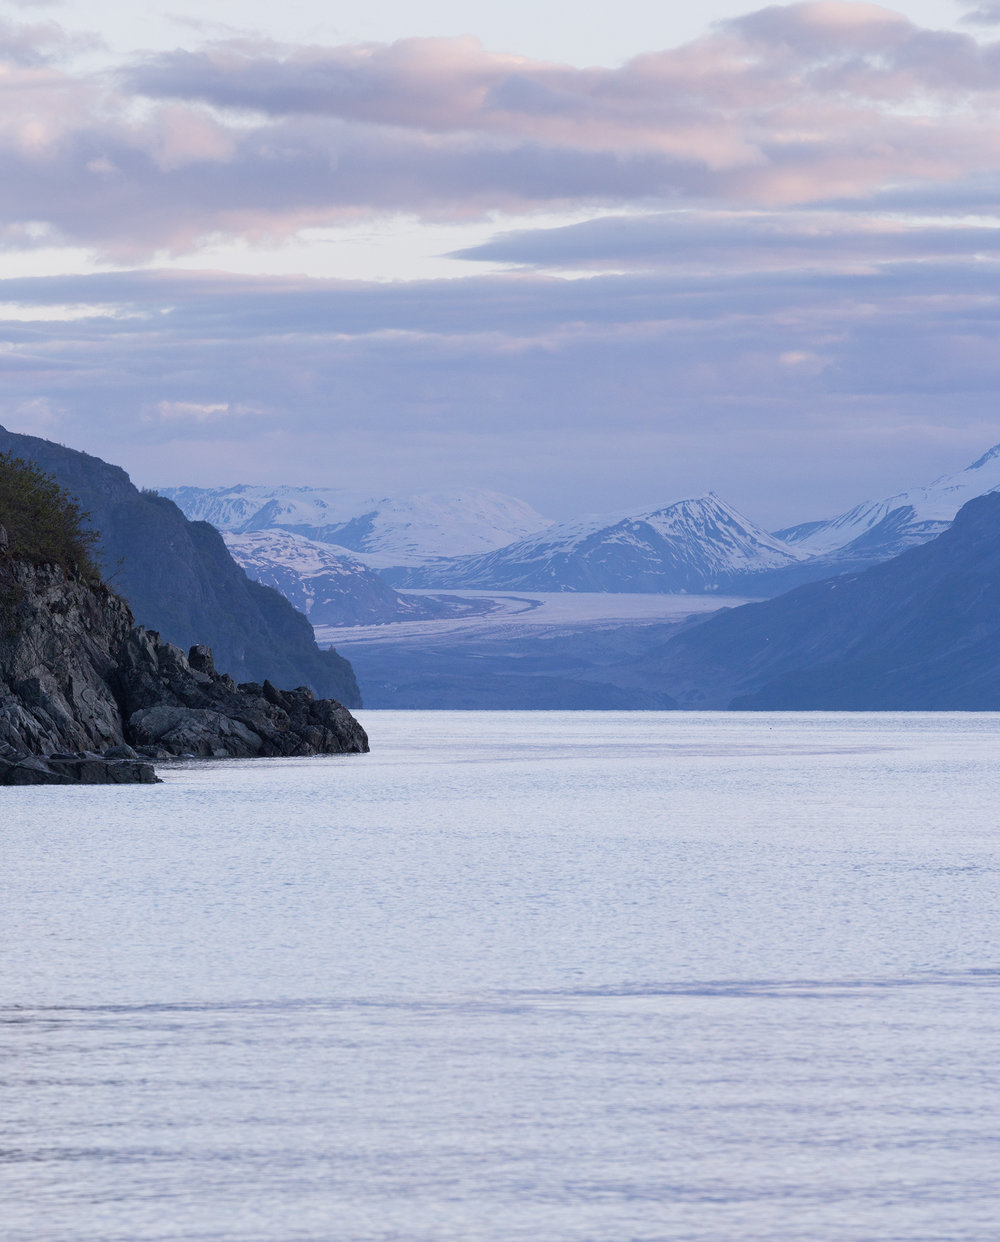 Glacier Bay National Park West Arm Kayaking Camping Trip-83.jpg